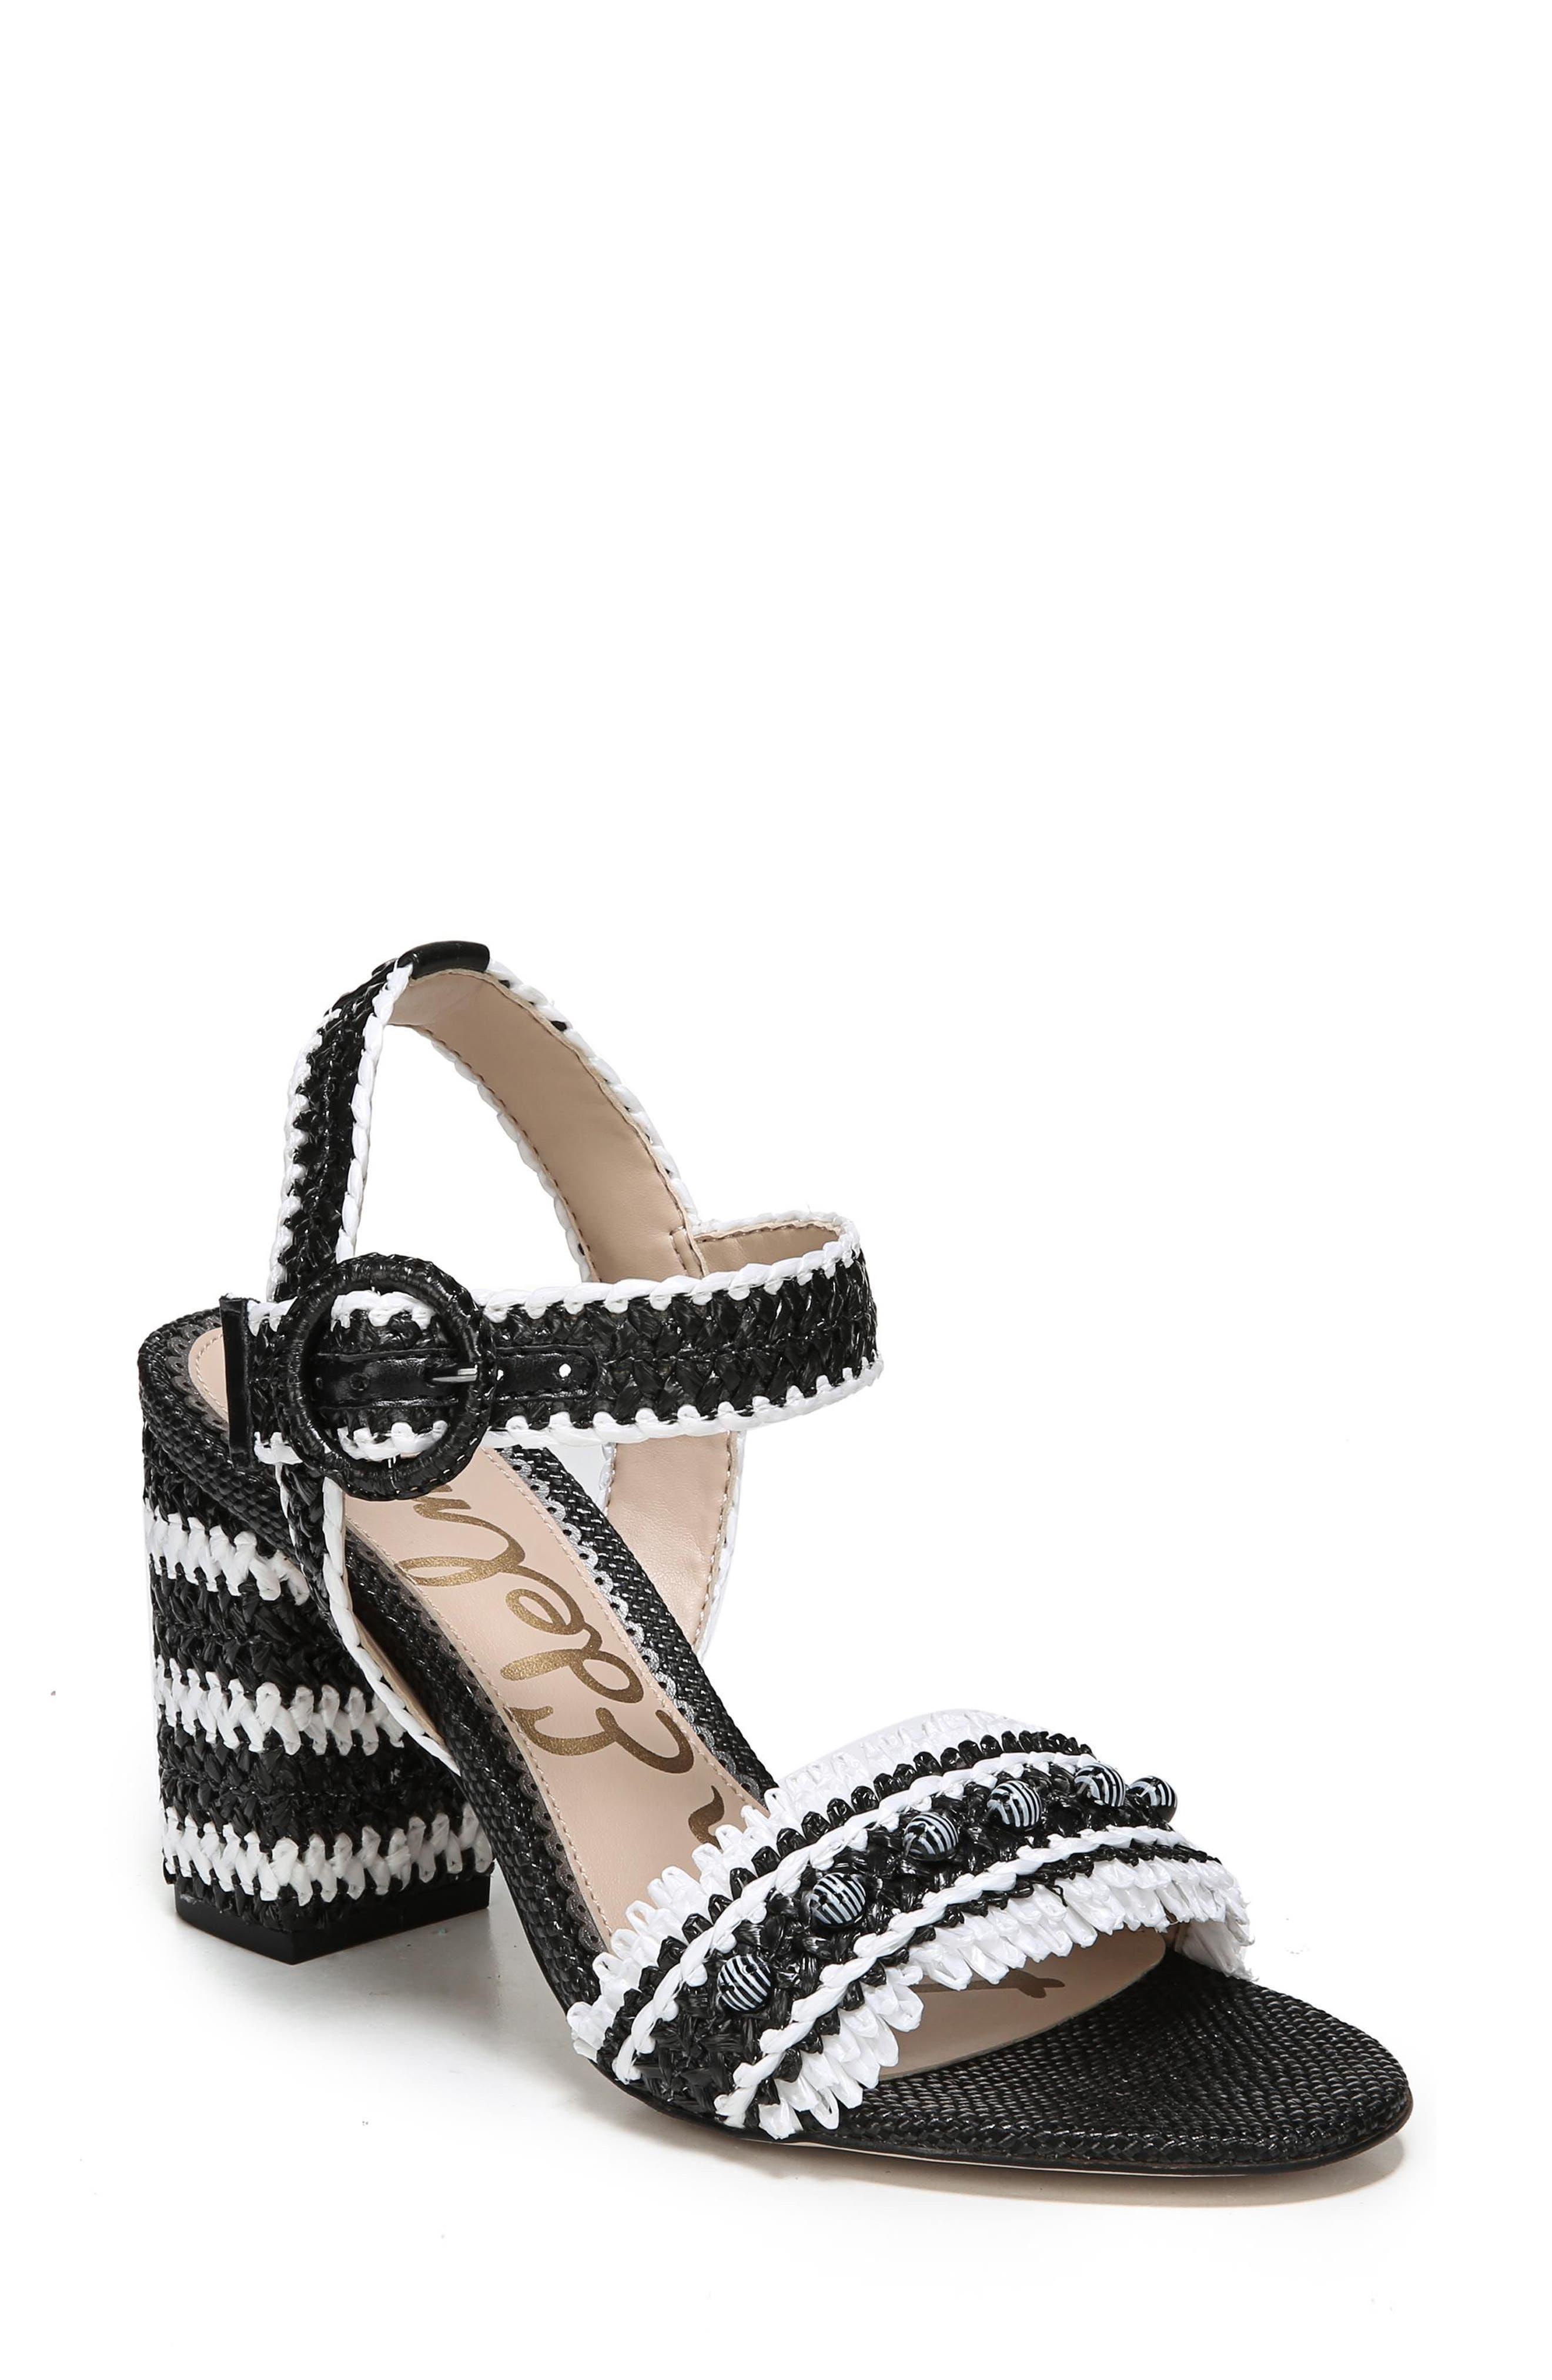 Olisa Block Heel Sandal,                         Main,                         color, 001